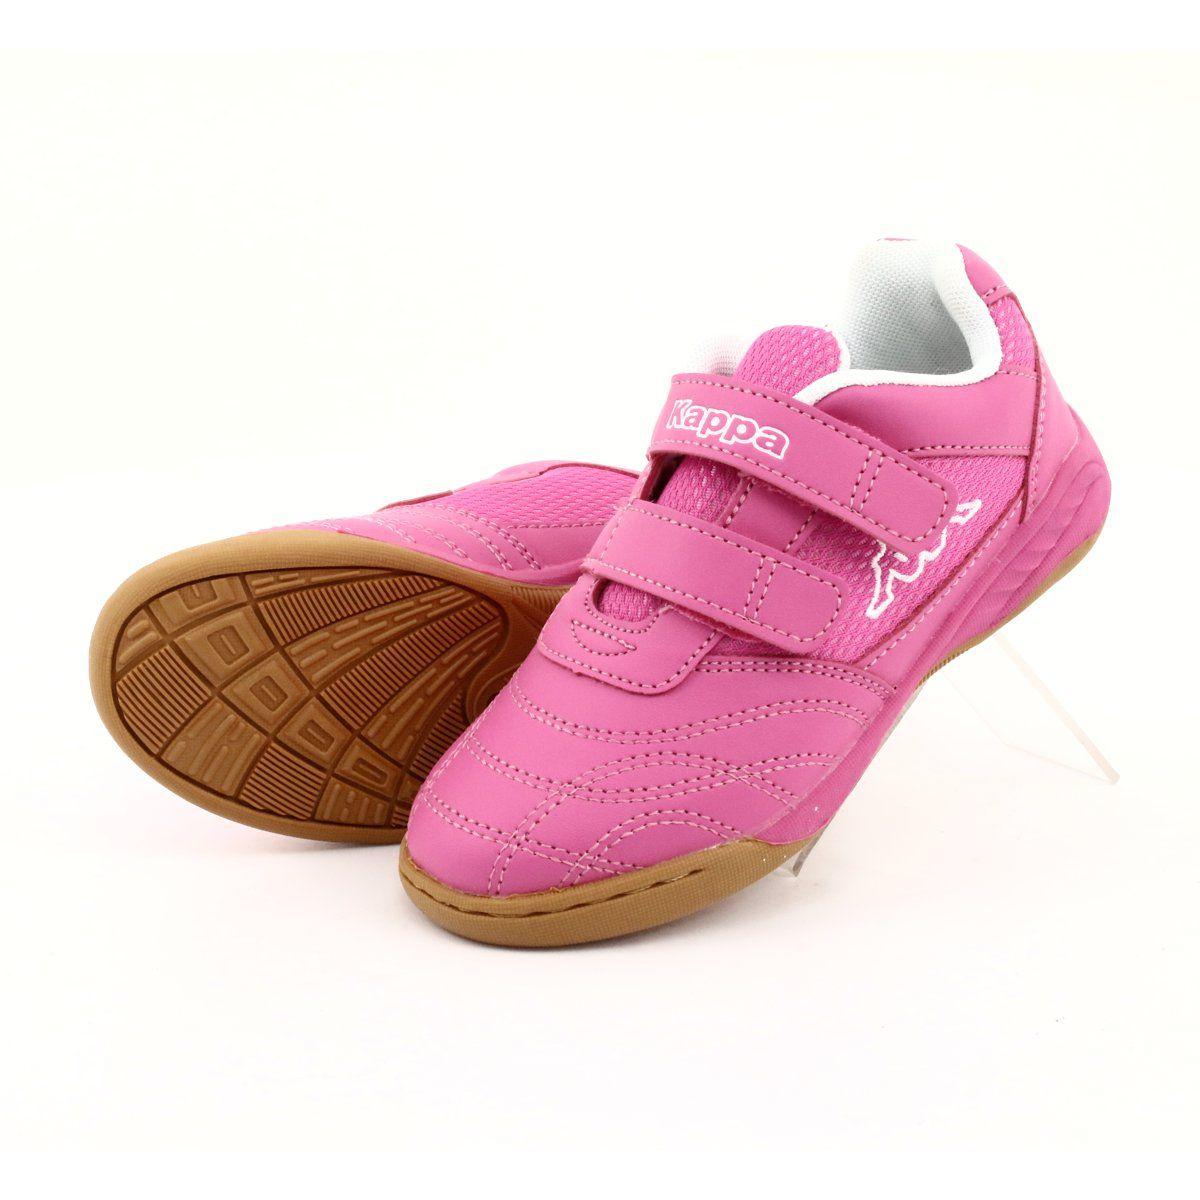 Buty Kappa Kickoff Oc Jr260695k 2210 Kid Shoes Childrens Shoes Shoes